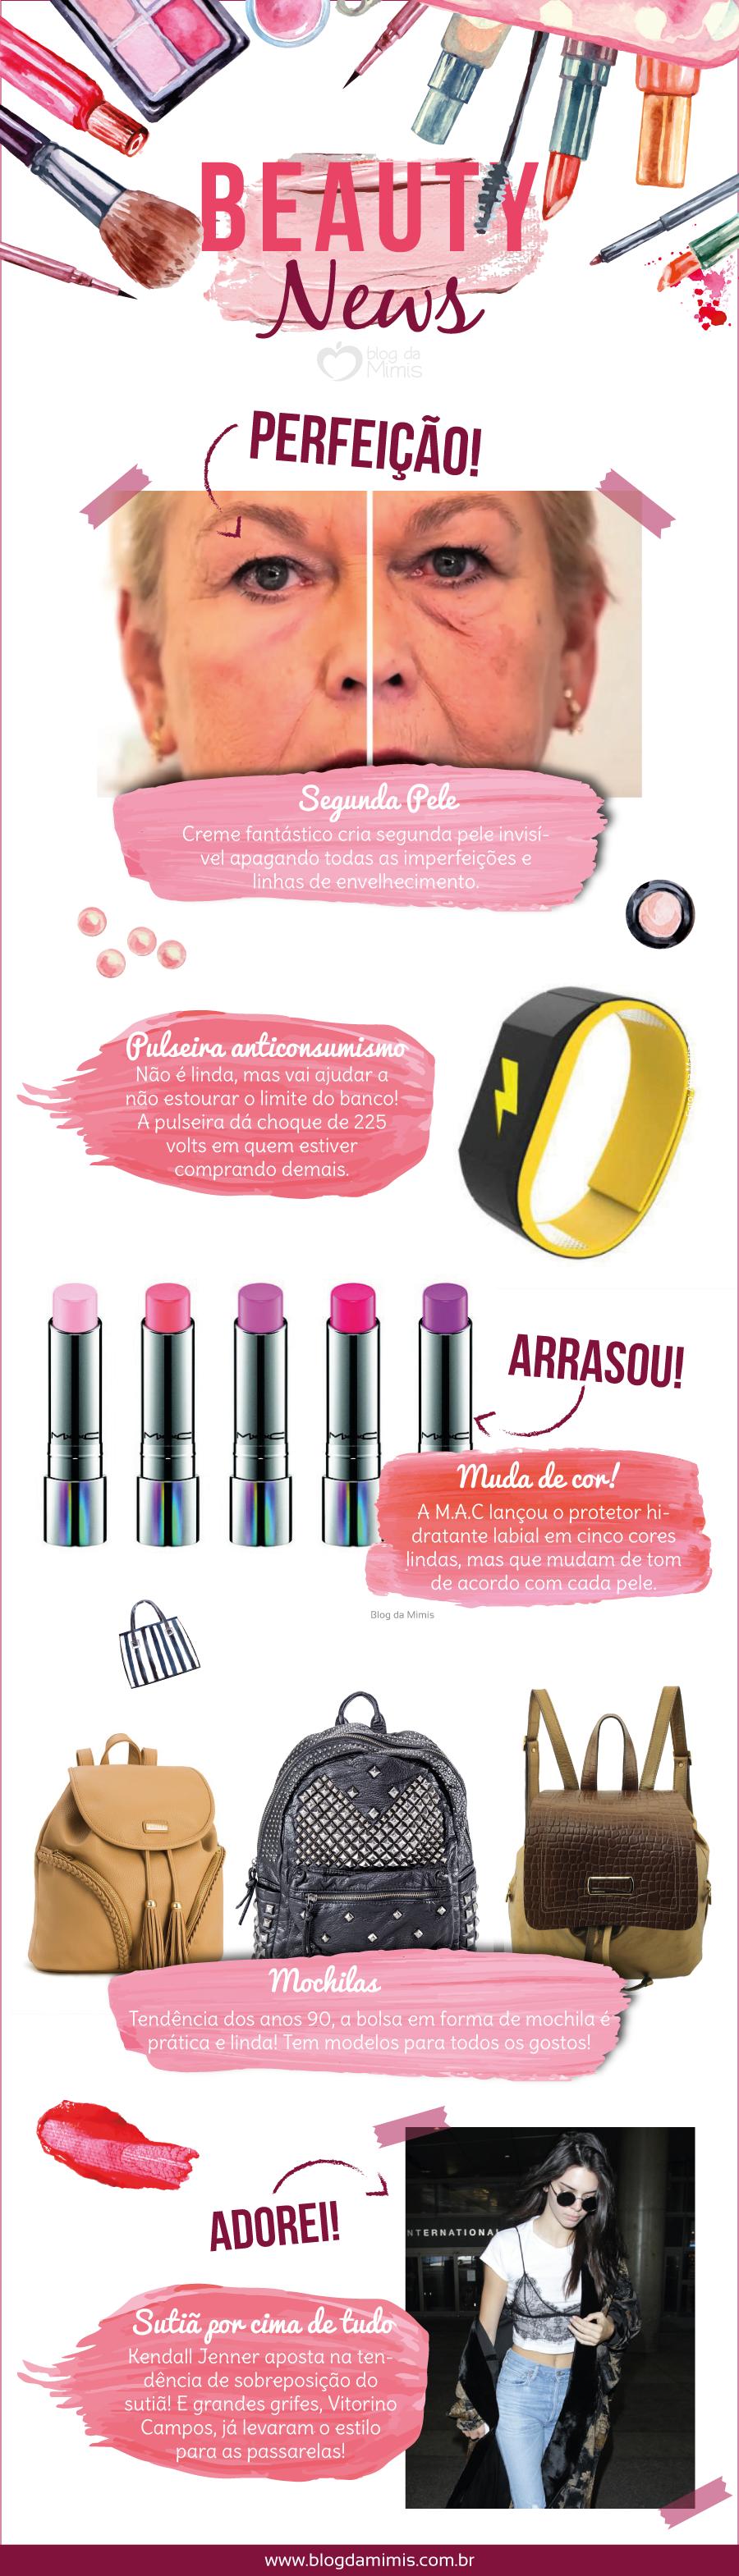 beauty-news-julho-2016-blog-da-mimis-michelle-franzoni-post